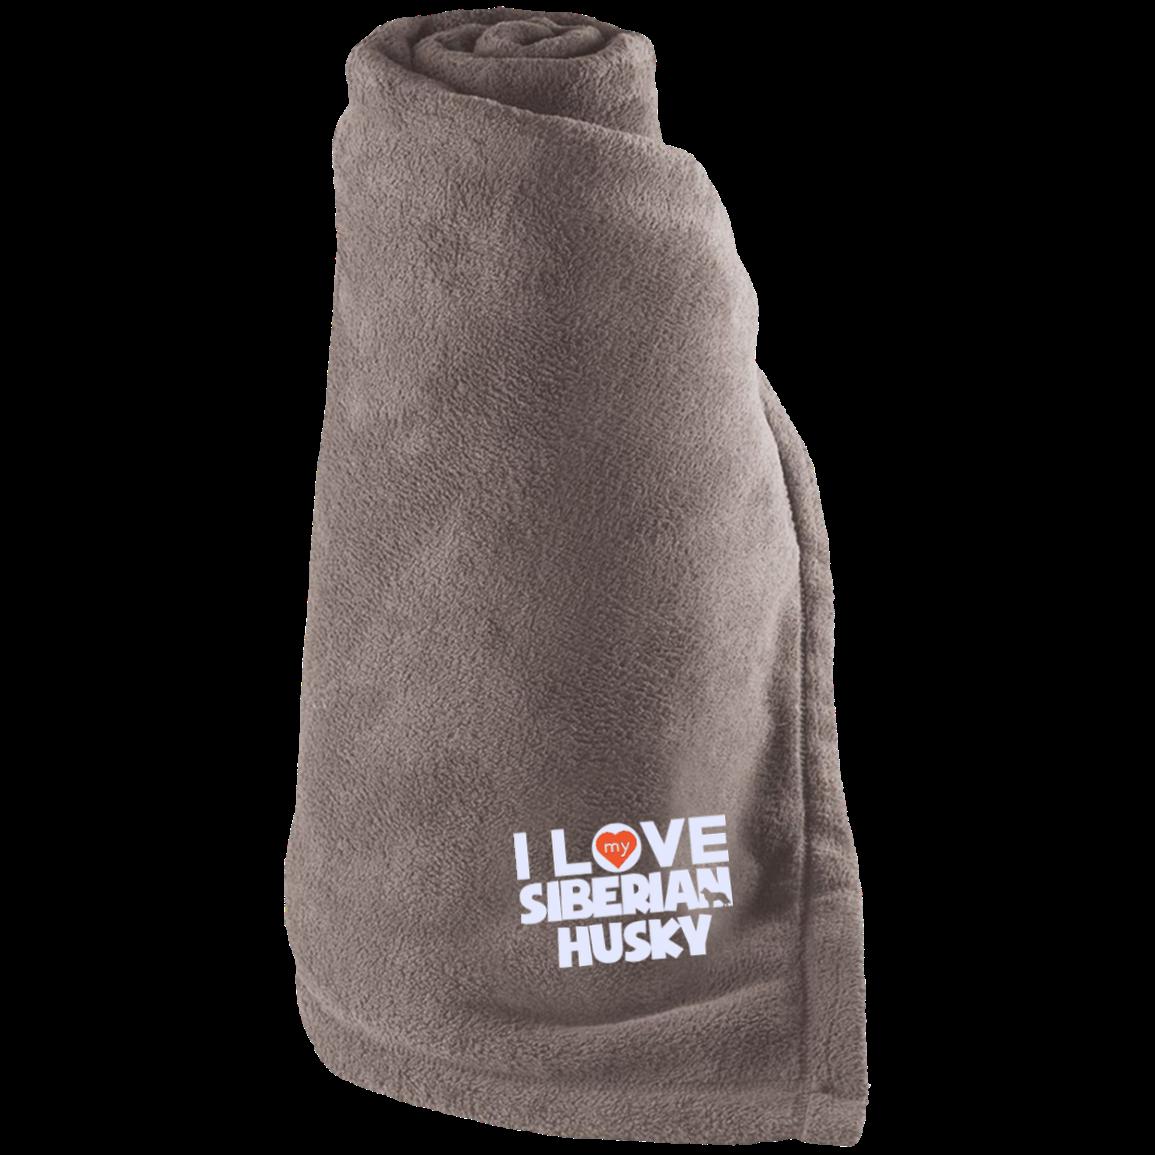 I Love My Siberian Husky - Large Fleece Blanket